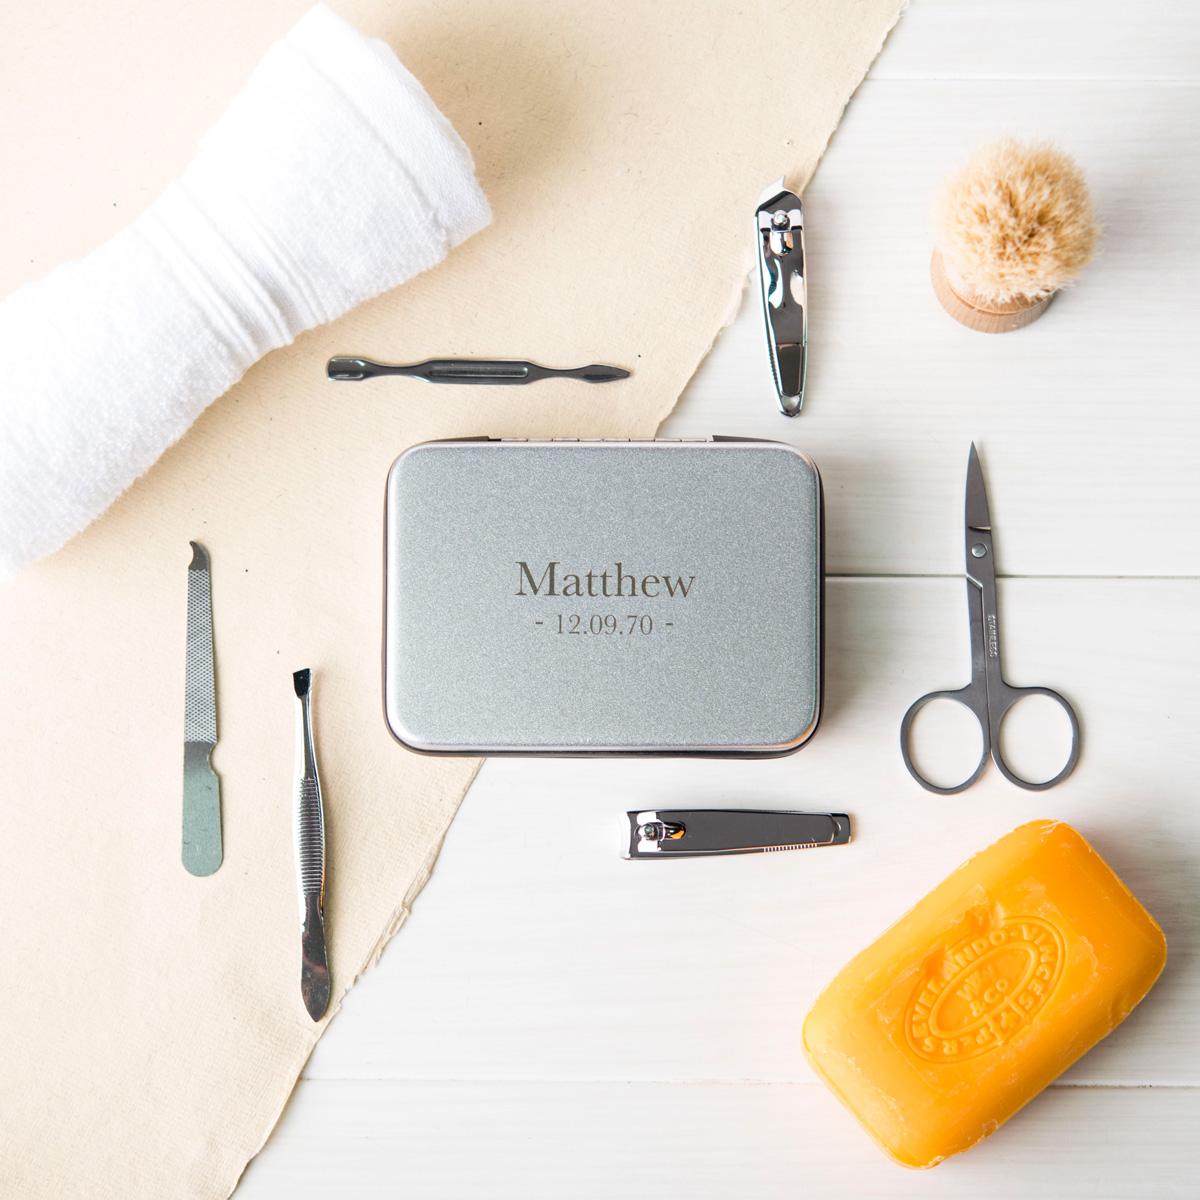 Personalised Luxury Manicure Set - Name & Date